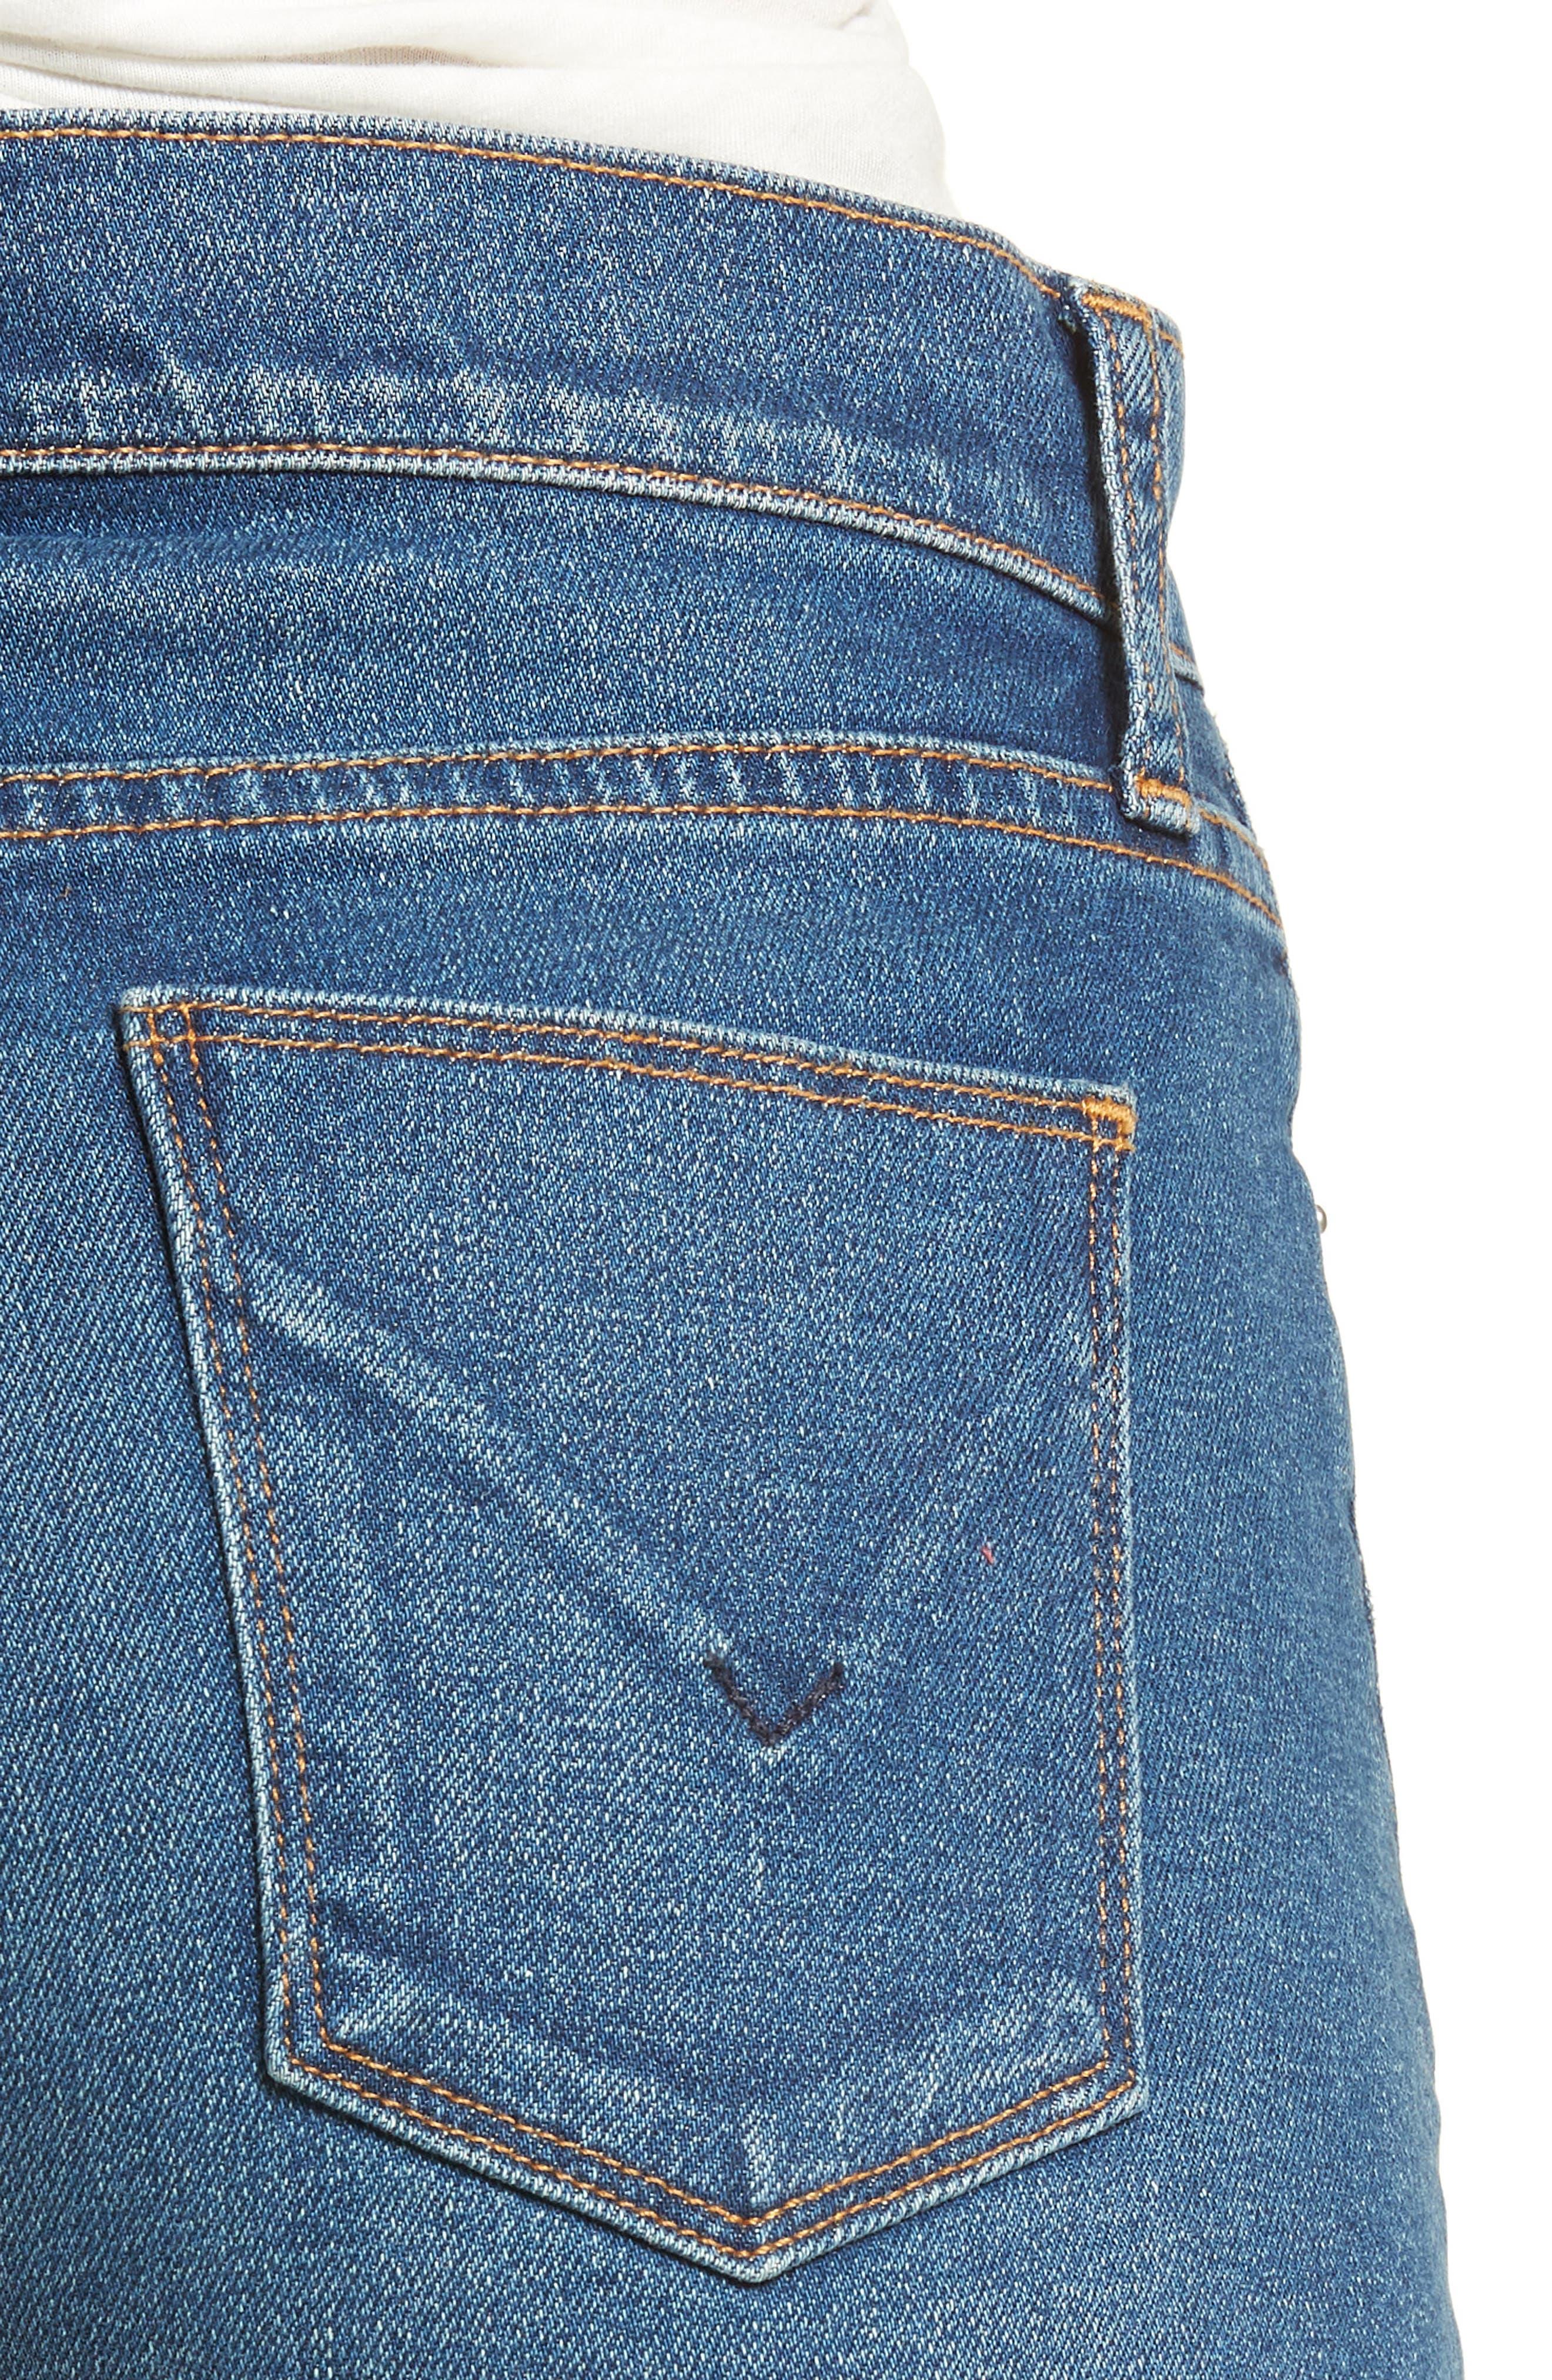 Valeri Cutoff Denim Shorts,                             Alternate thumbnail 4, color,                             Take Flight